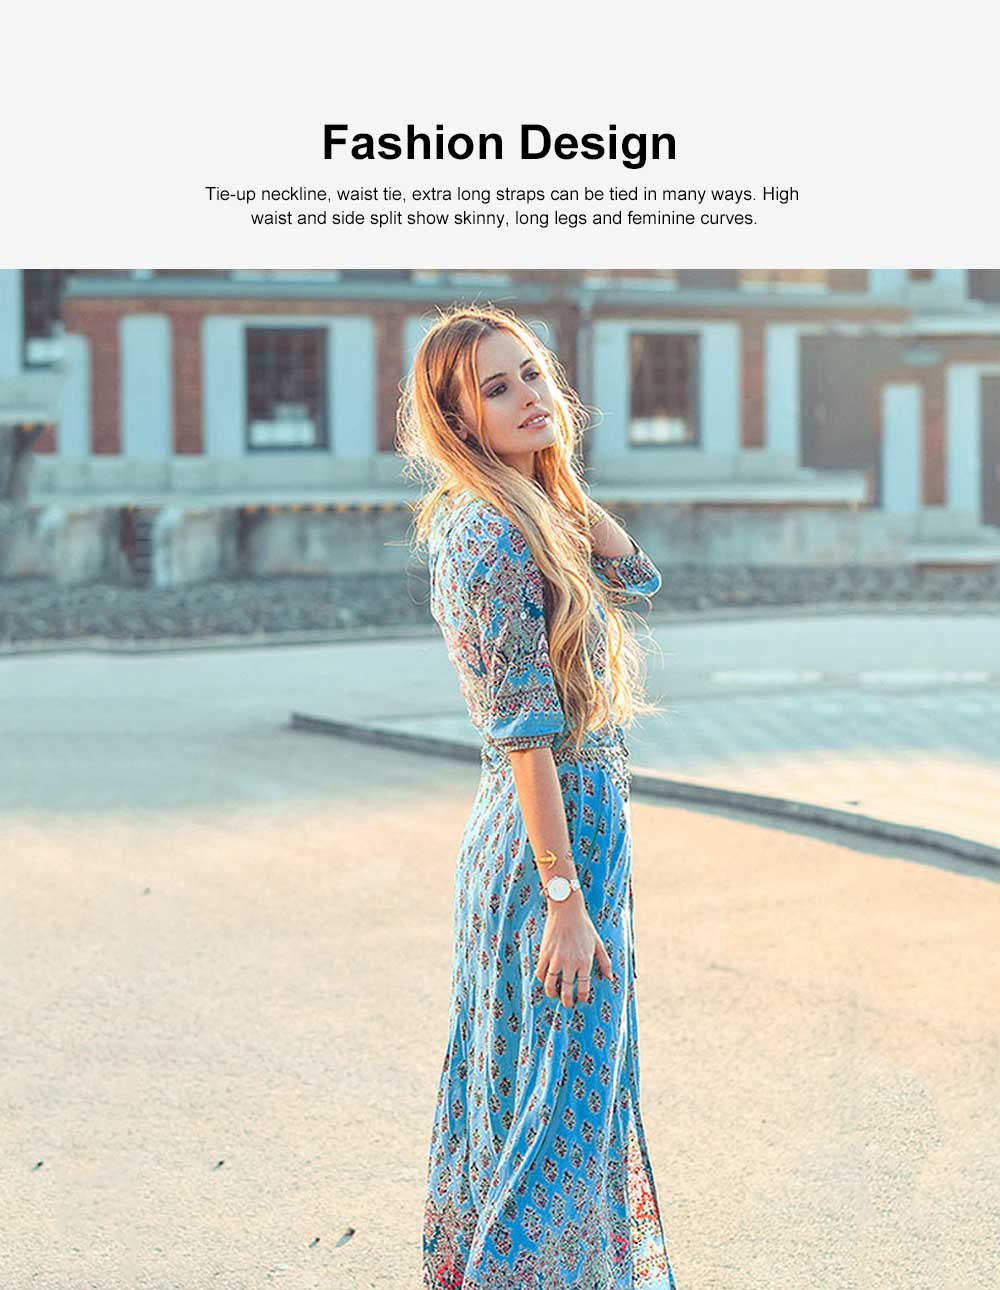 Women Floral Printed Maxi Dress, Deep V-neck Long Beach Dresses, Bohemian Side Split Dresses with Buttons 2